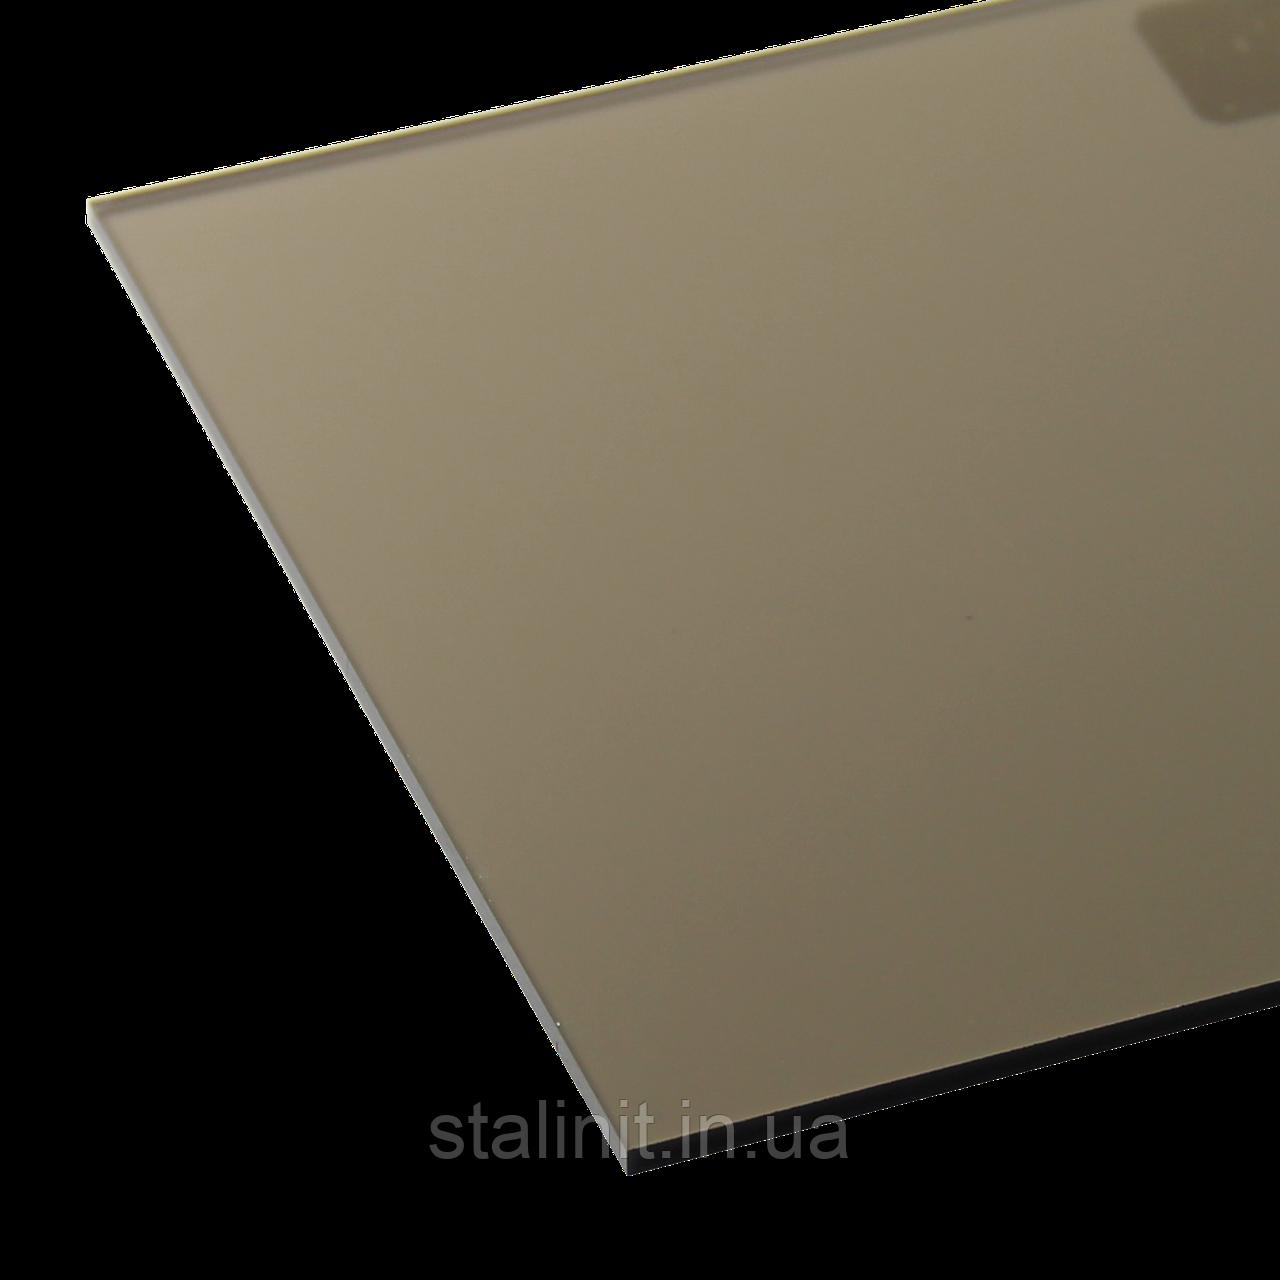 Монолитный поликарбонат PULSUN d=3 mm бронза